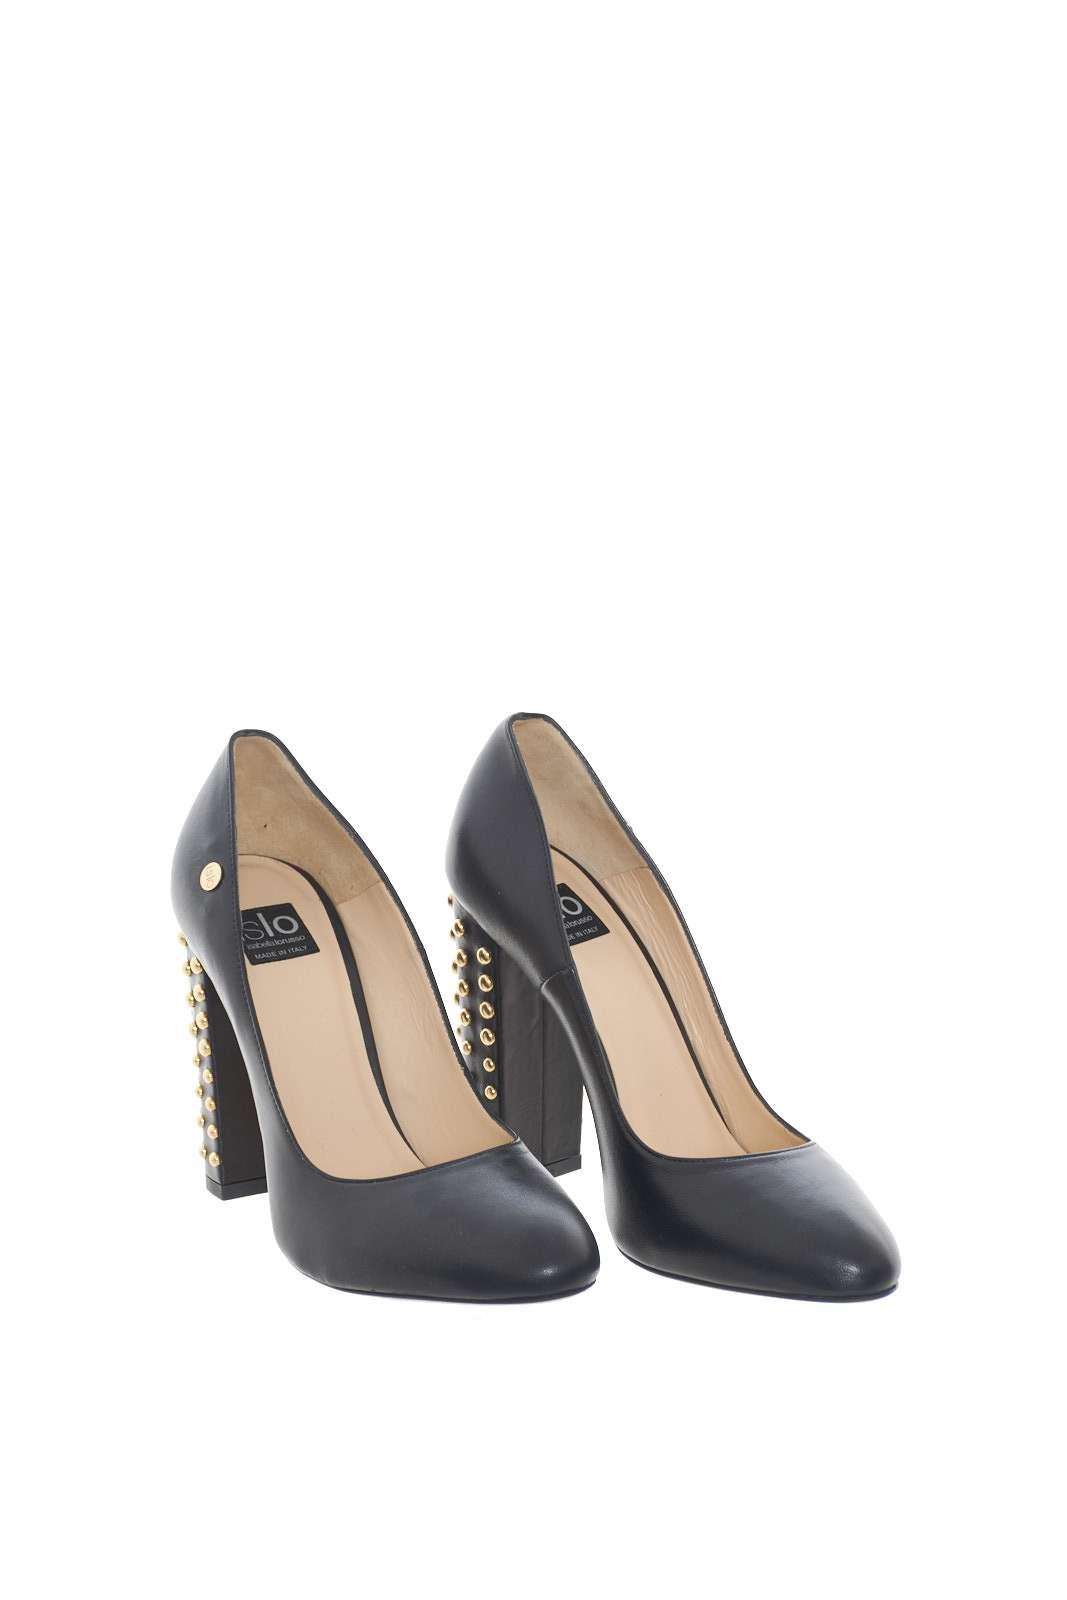 https://www.parmax.com/media/catalog/product/a/i/AI-outlet_parmax-scarpe-donna-isabella-Lorusso-CELIA-D_1.jpg